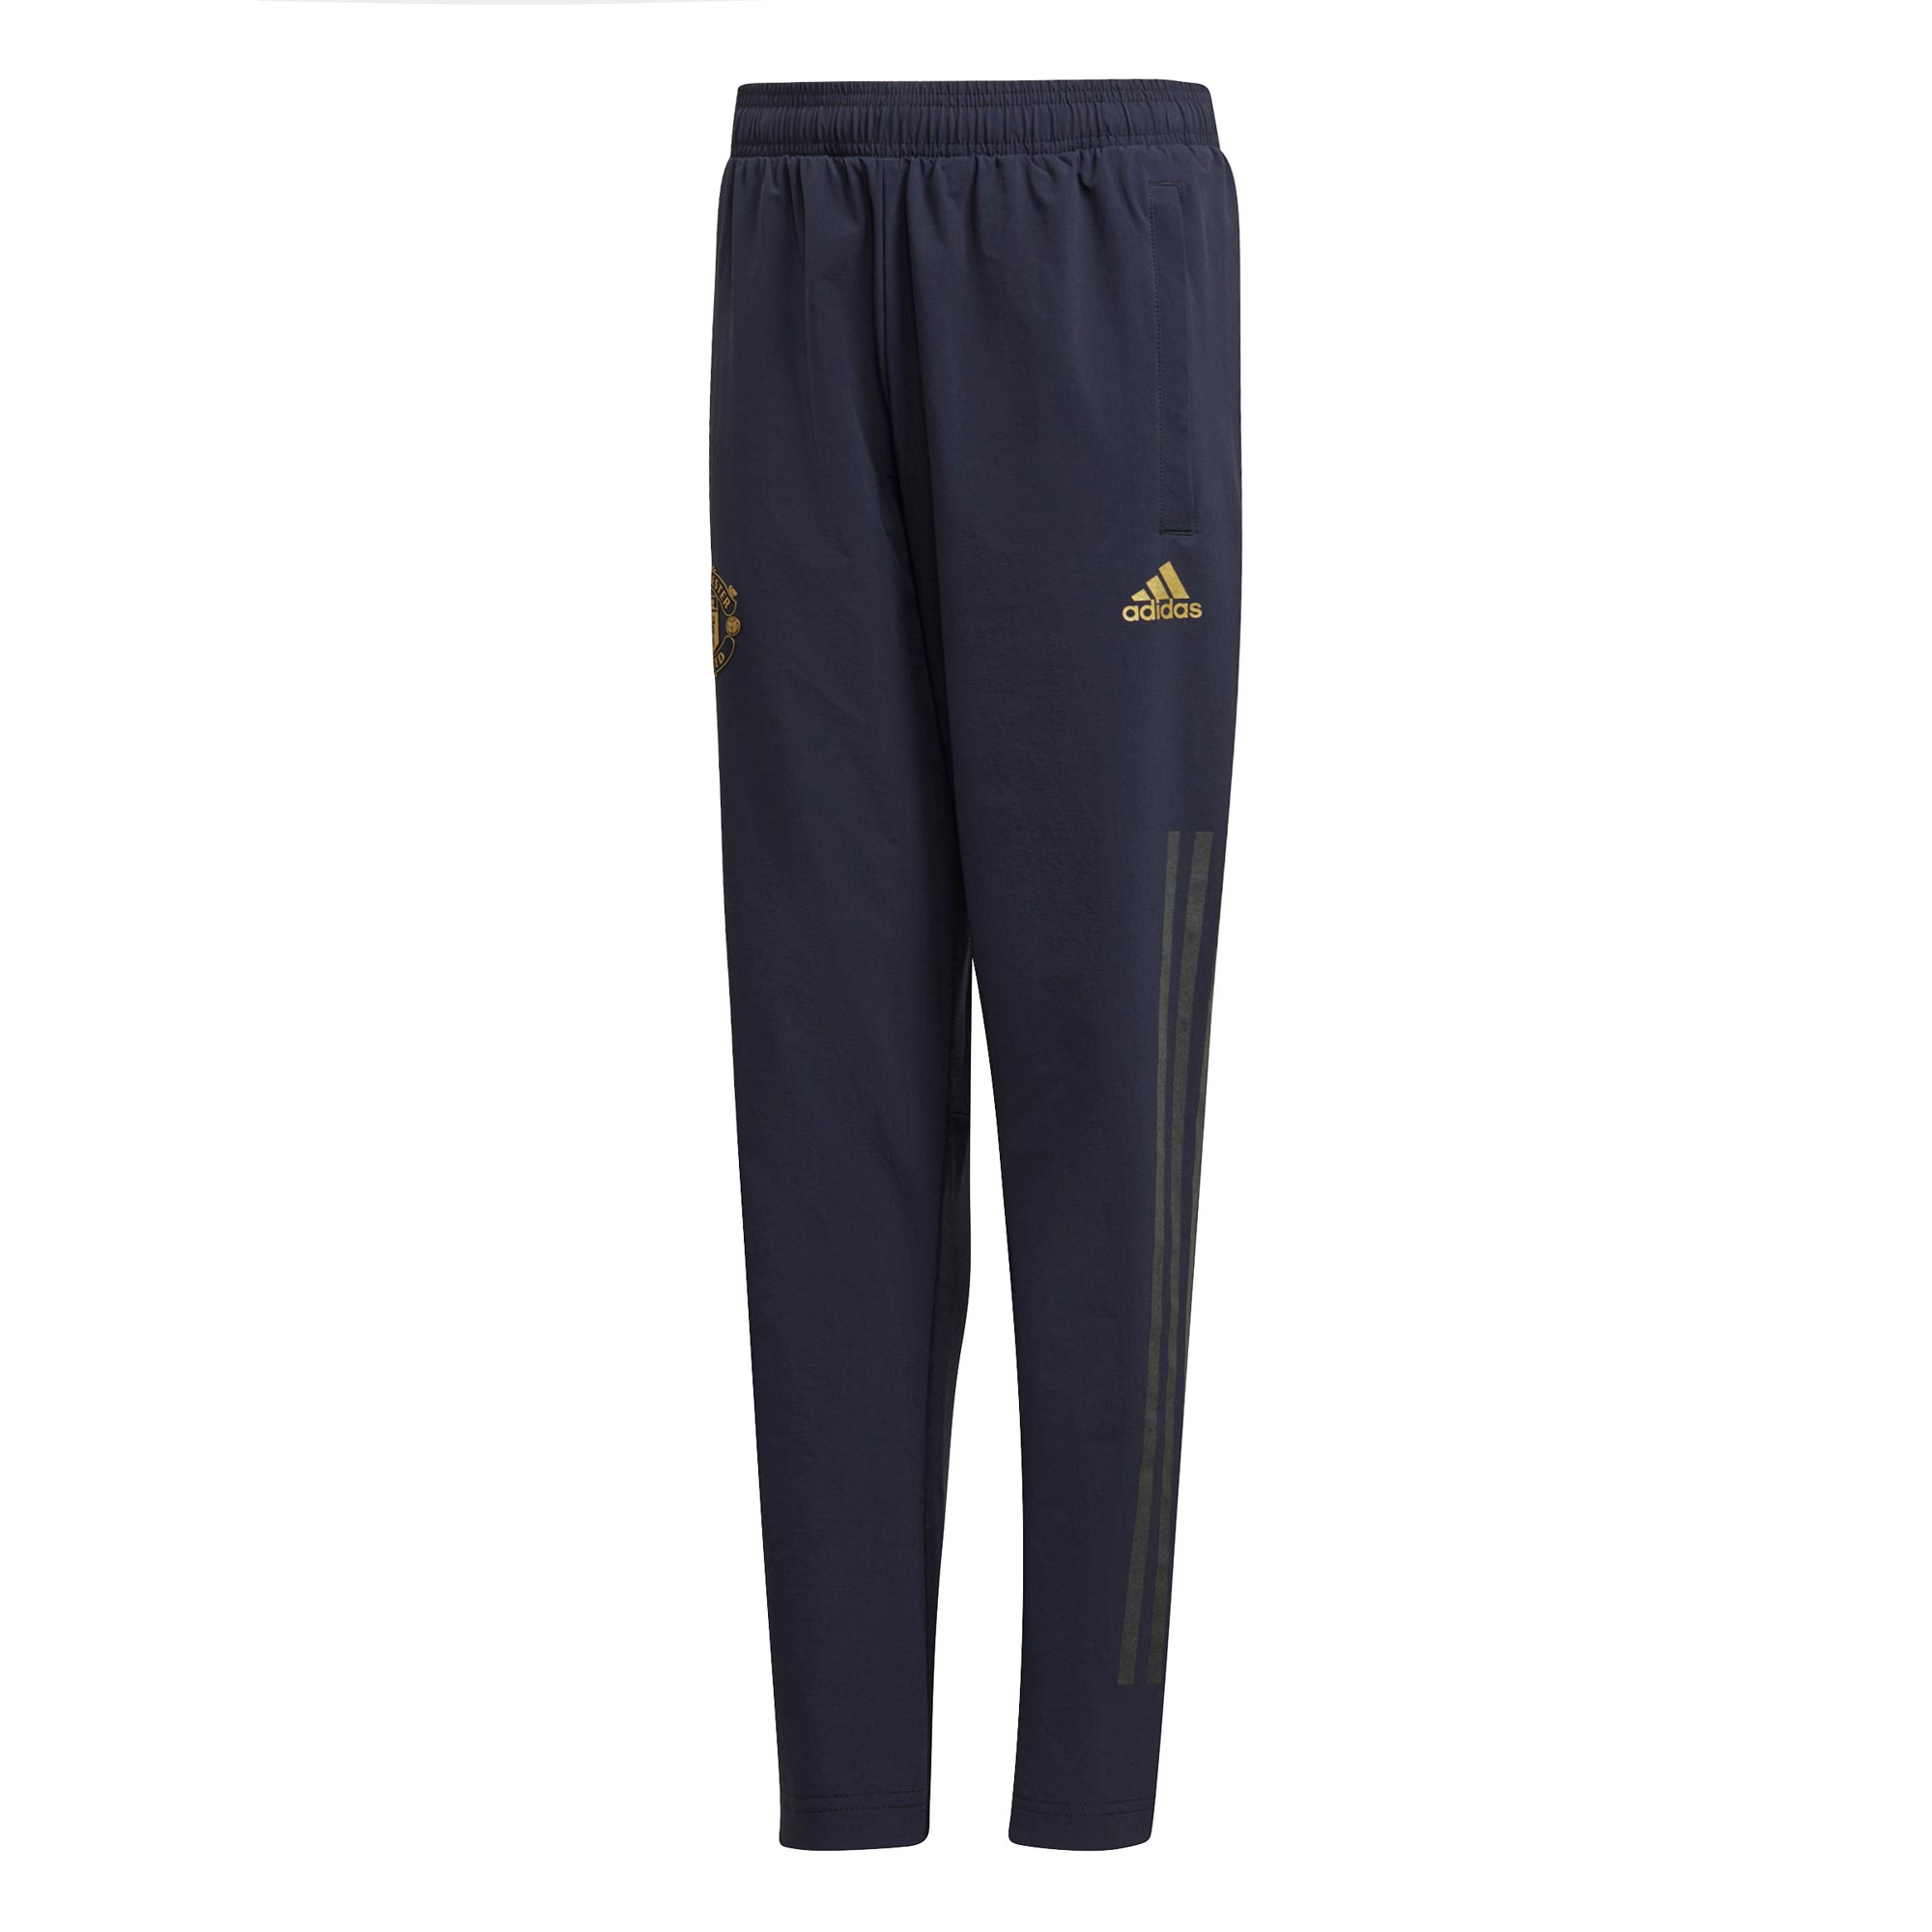 Pantalon d'entraînement UCL Manchester United - Bleu marine - Enfant